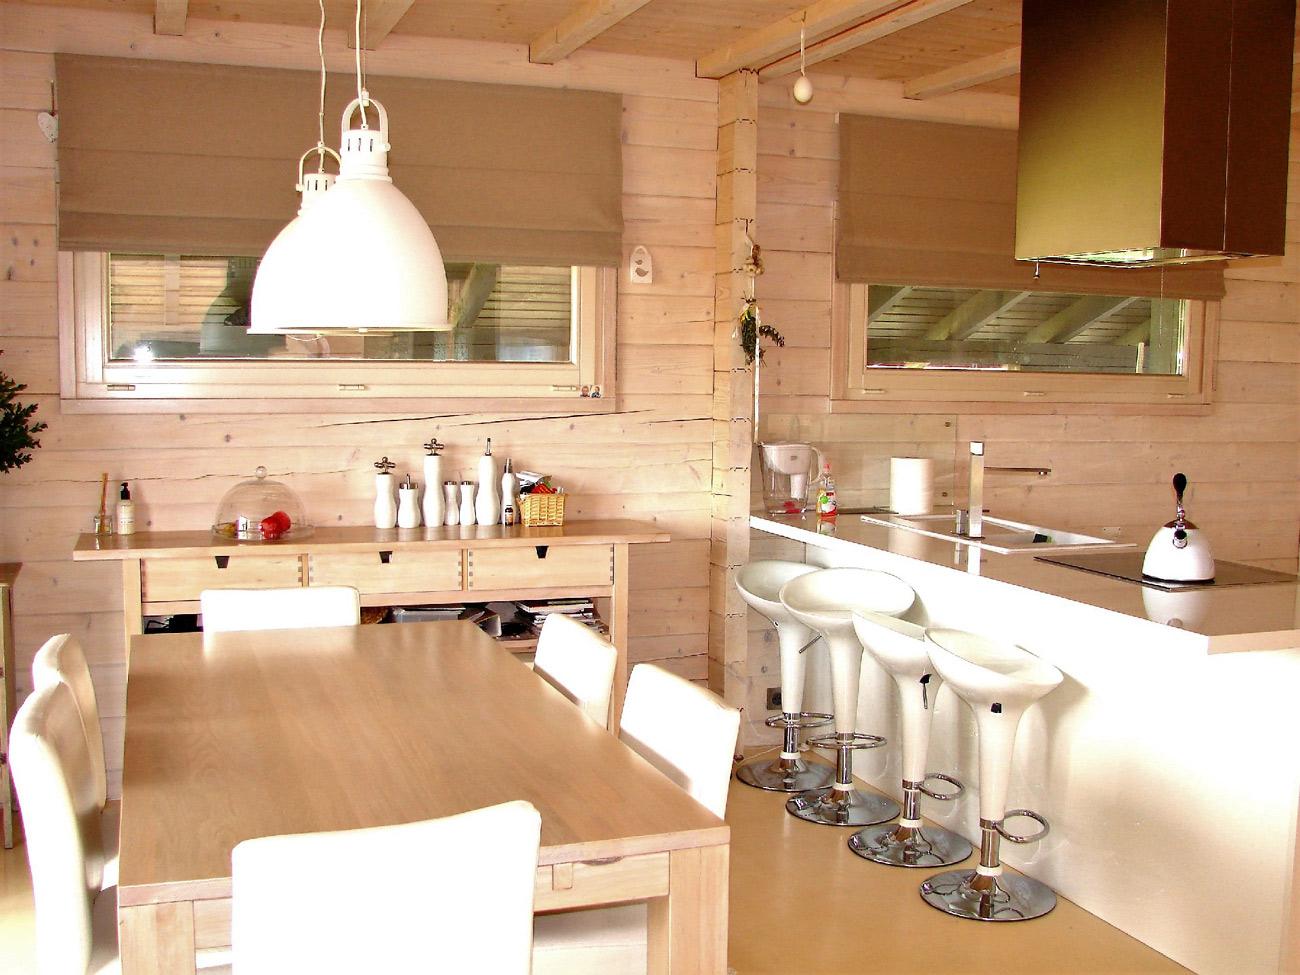 kuchnia-jadalnia-rolety+rzy